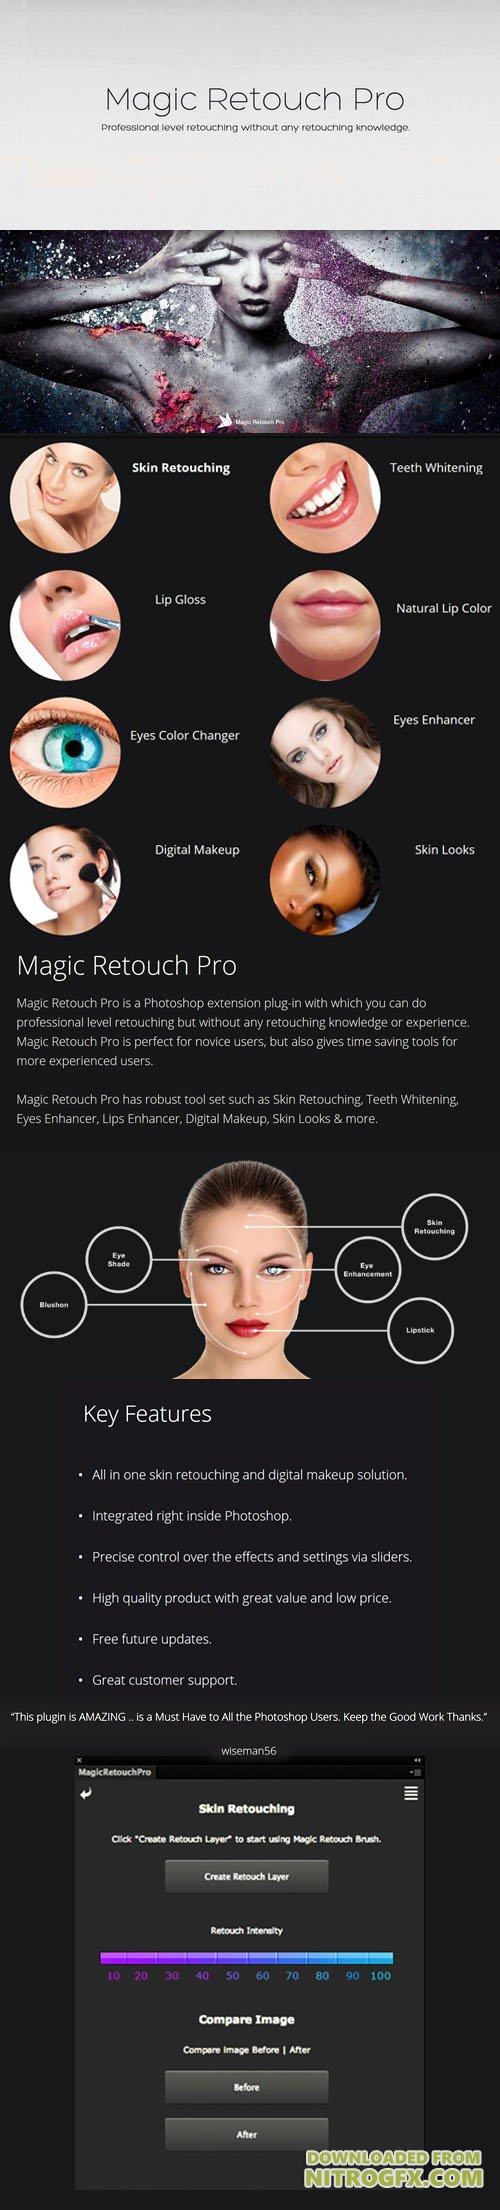 MAGIC RETOUCH PRO 4 2 PLUGIN FOR PHOTOSHOP (WIN/MAC) - Heroturko